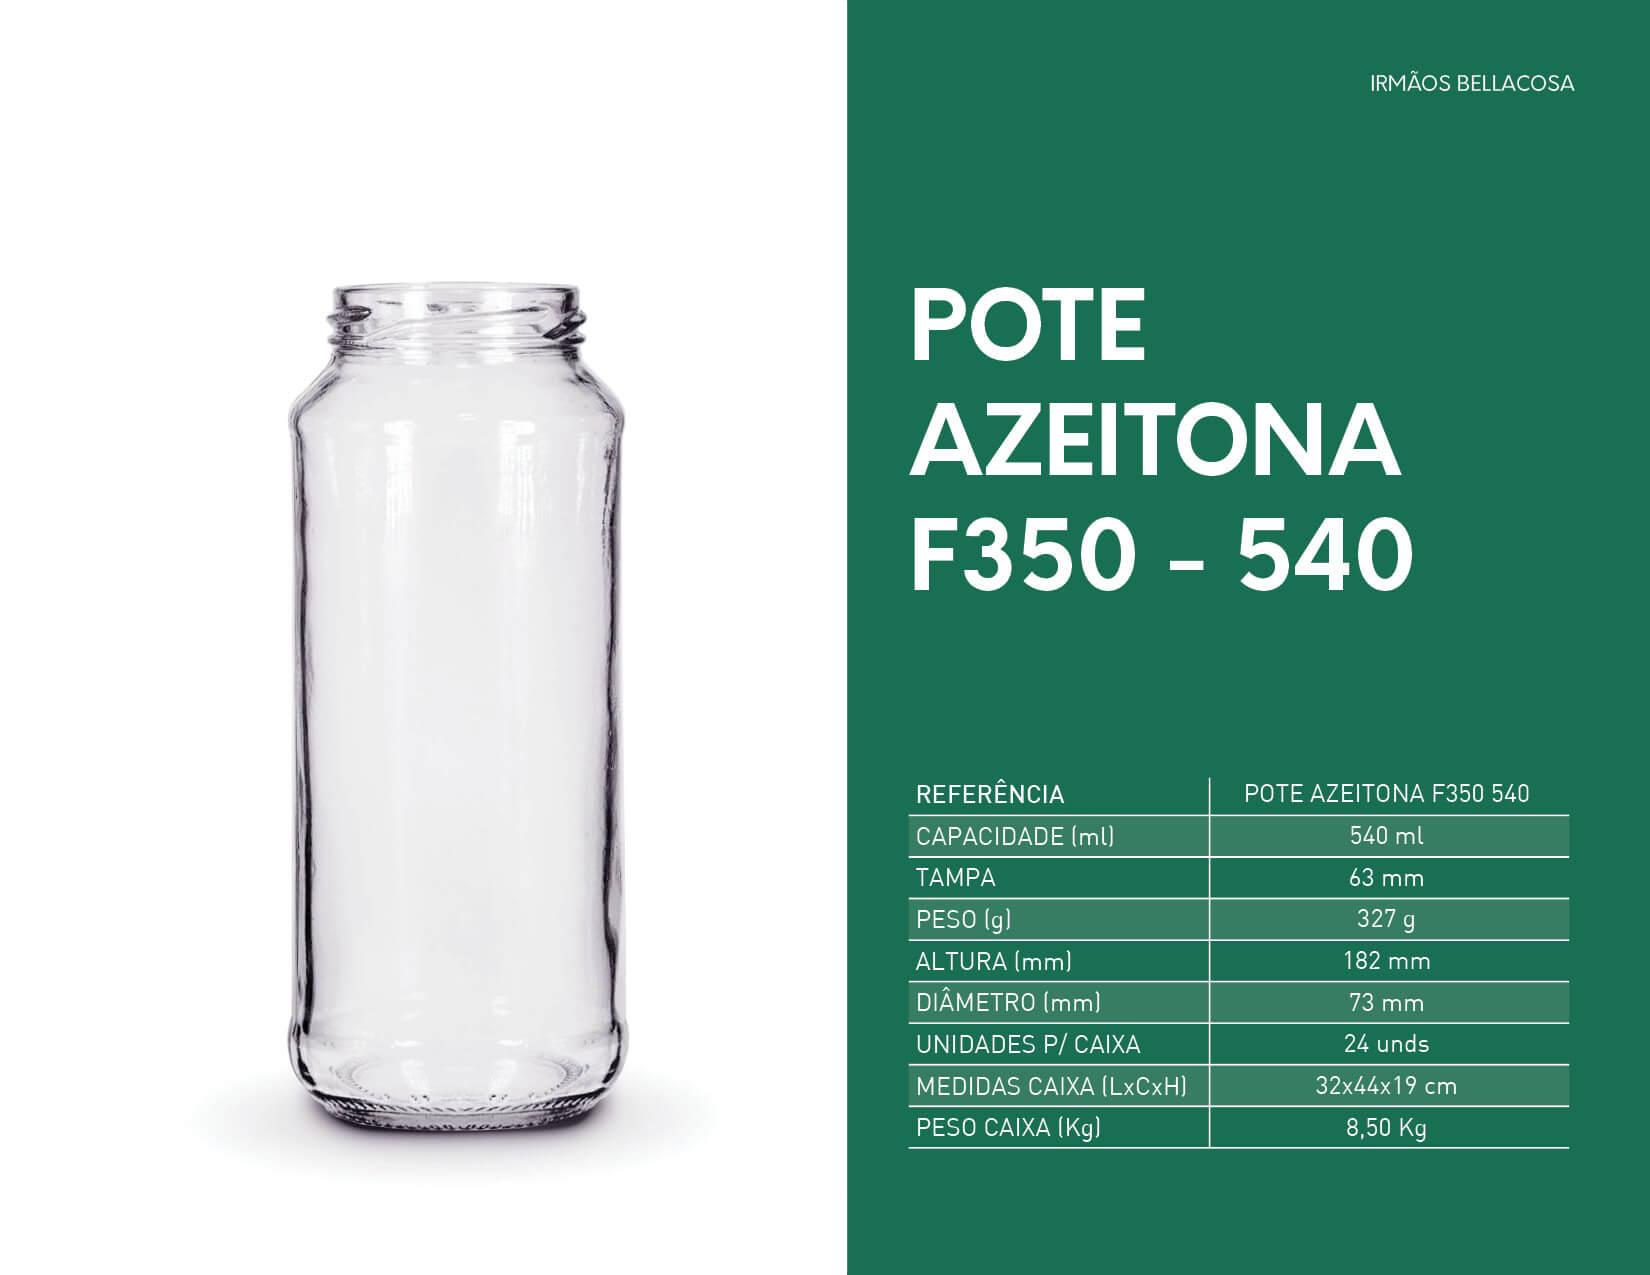 020-Pote-Azeitona-F350-540-irmaos-bellacosa-embalagens-de-vidro